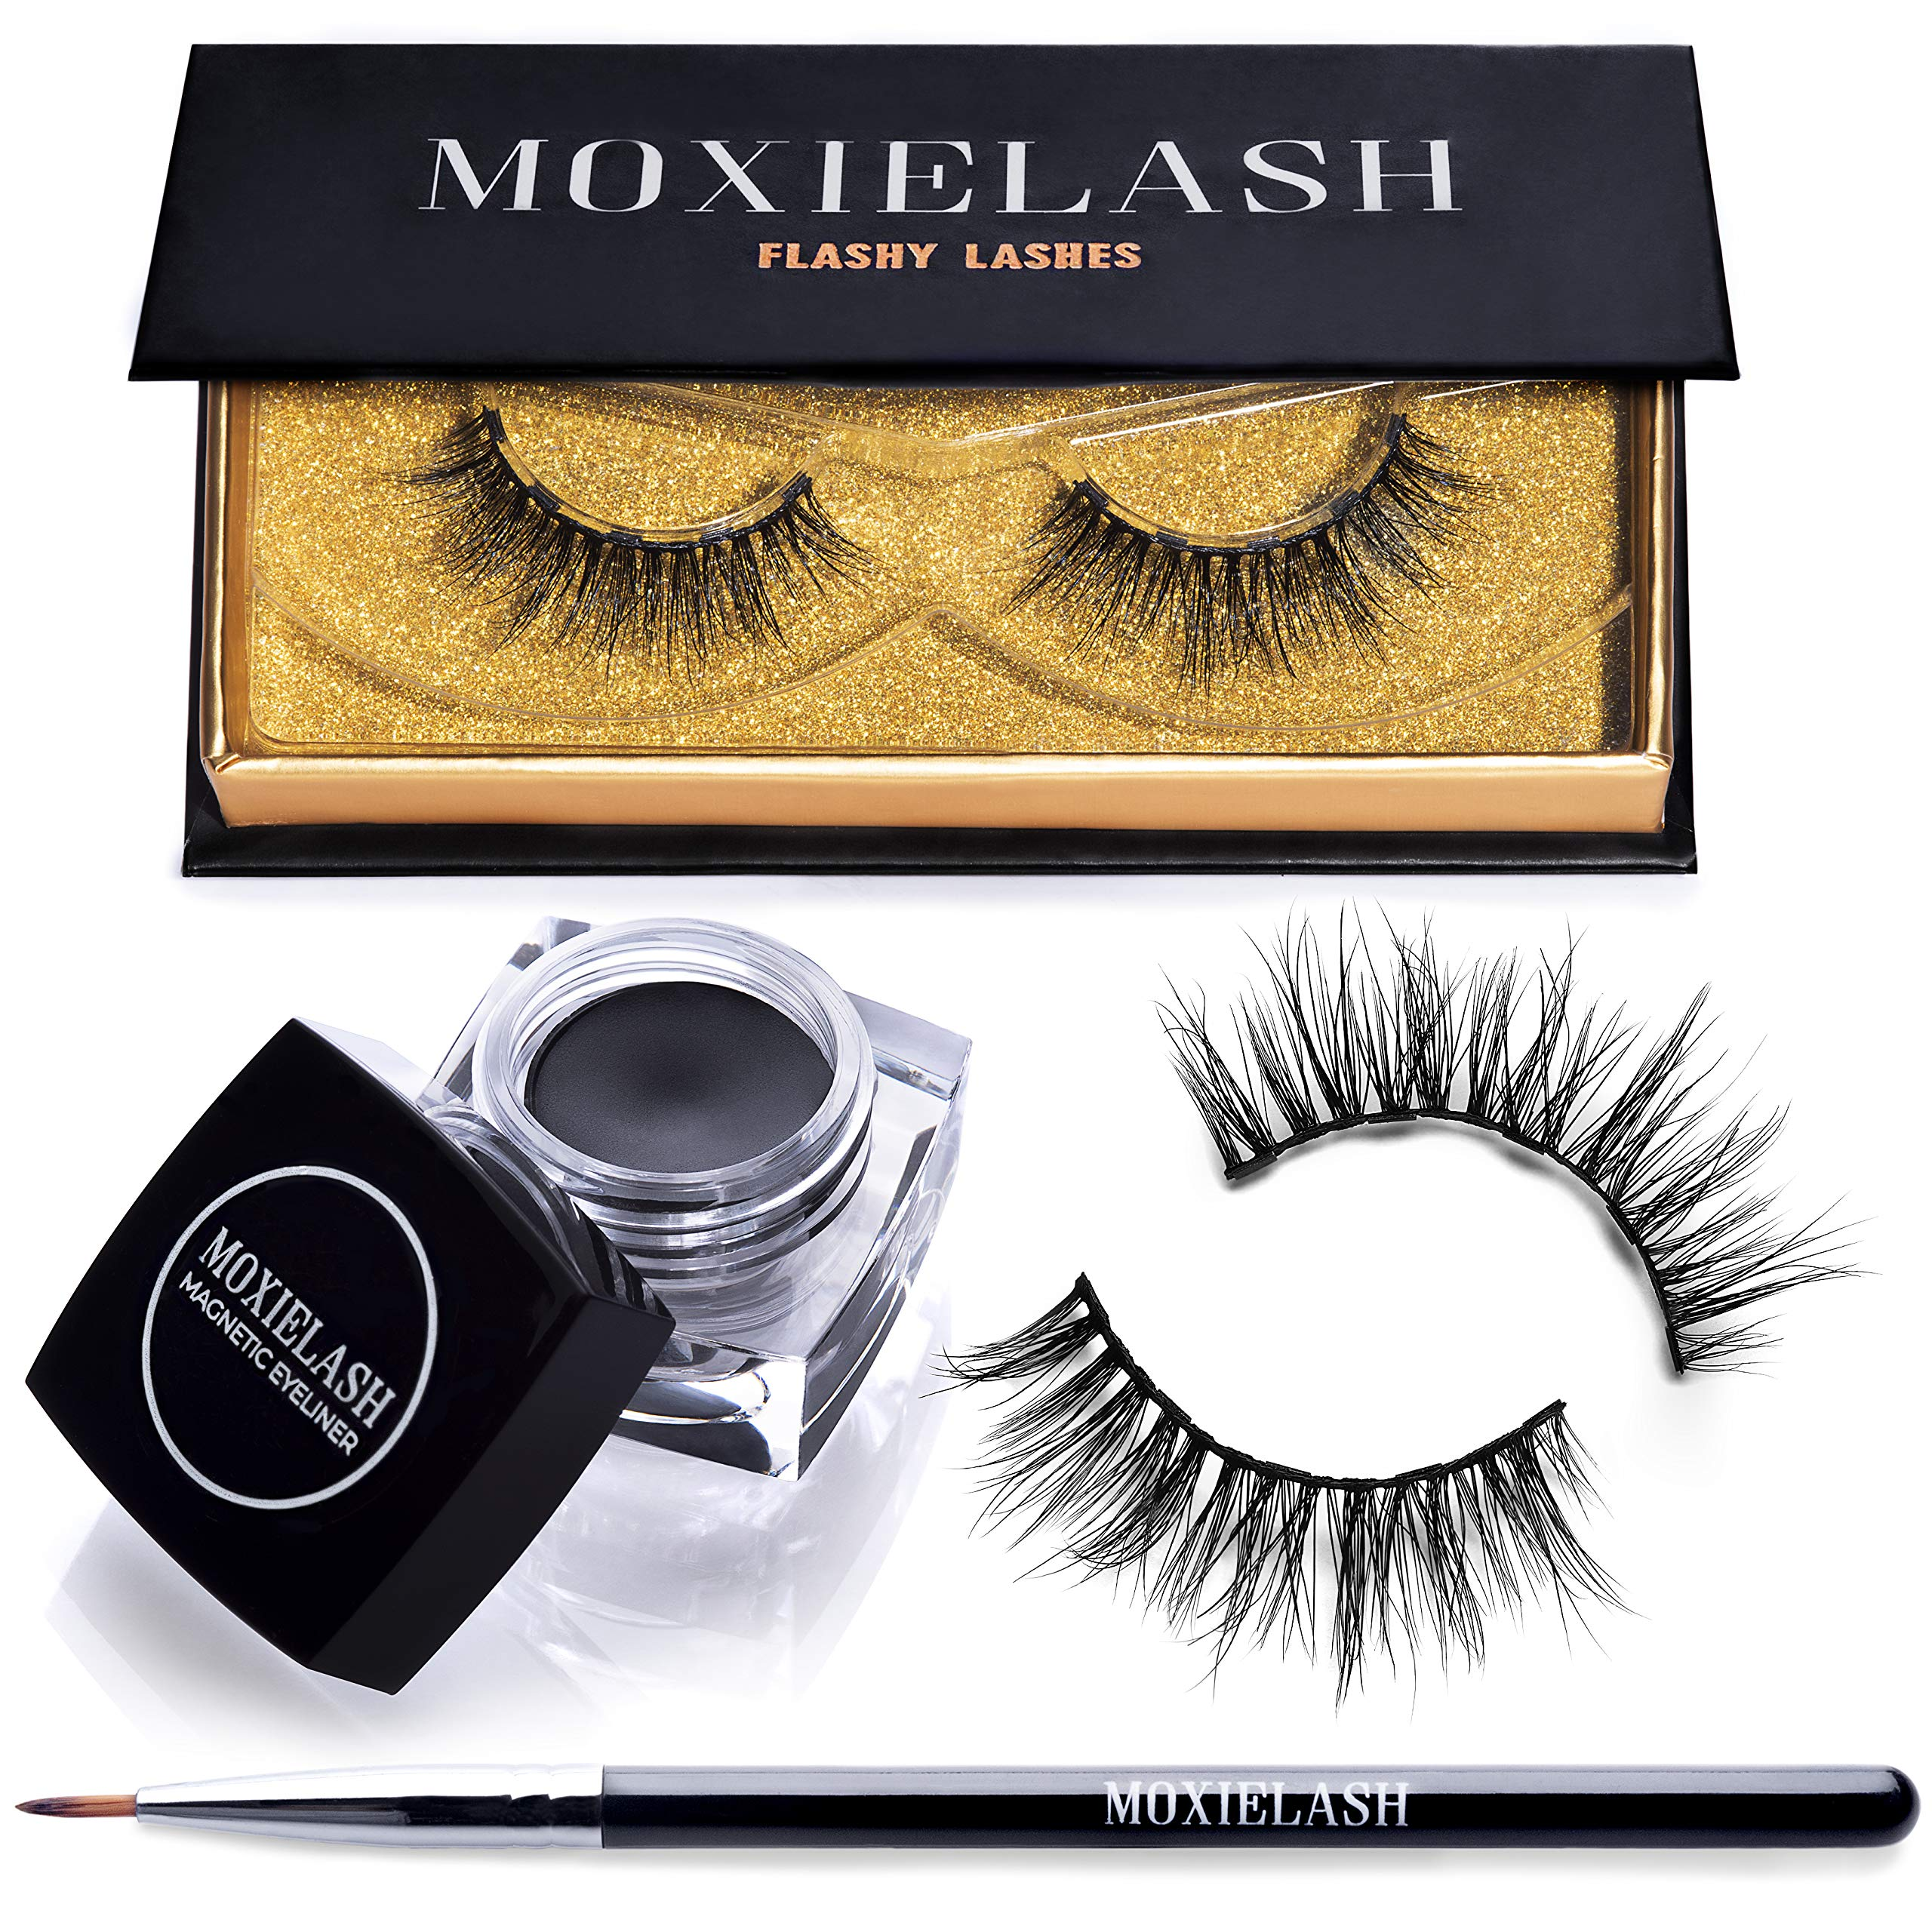 MoxieLash Flashy Bundle - MoxieLash Magnetic Gel Eyeliner for Magnetic Eyelashes - No Glue & Mess Free - Fast & Easy Application - Set of Flashy Lashes & Brush Included